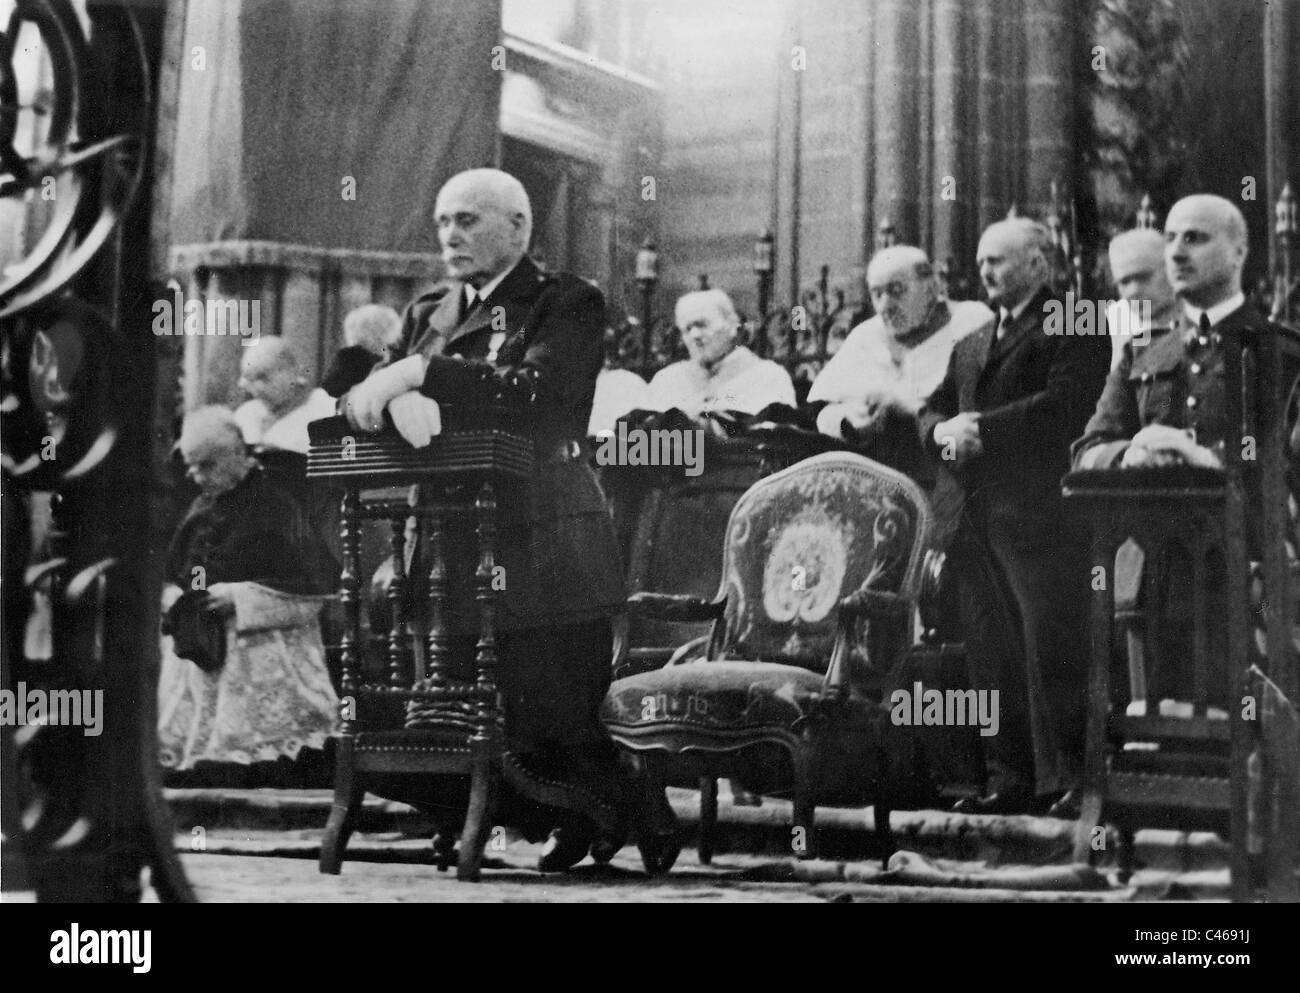 Henri Philippe Petain during the celebration of the Armistice, 1940 - Stock Image